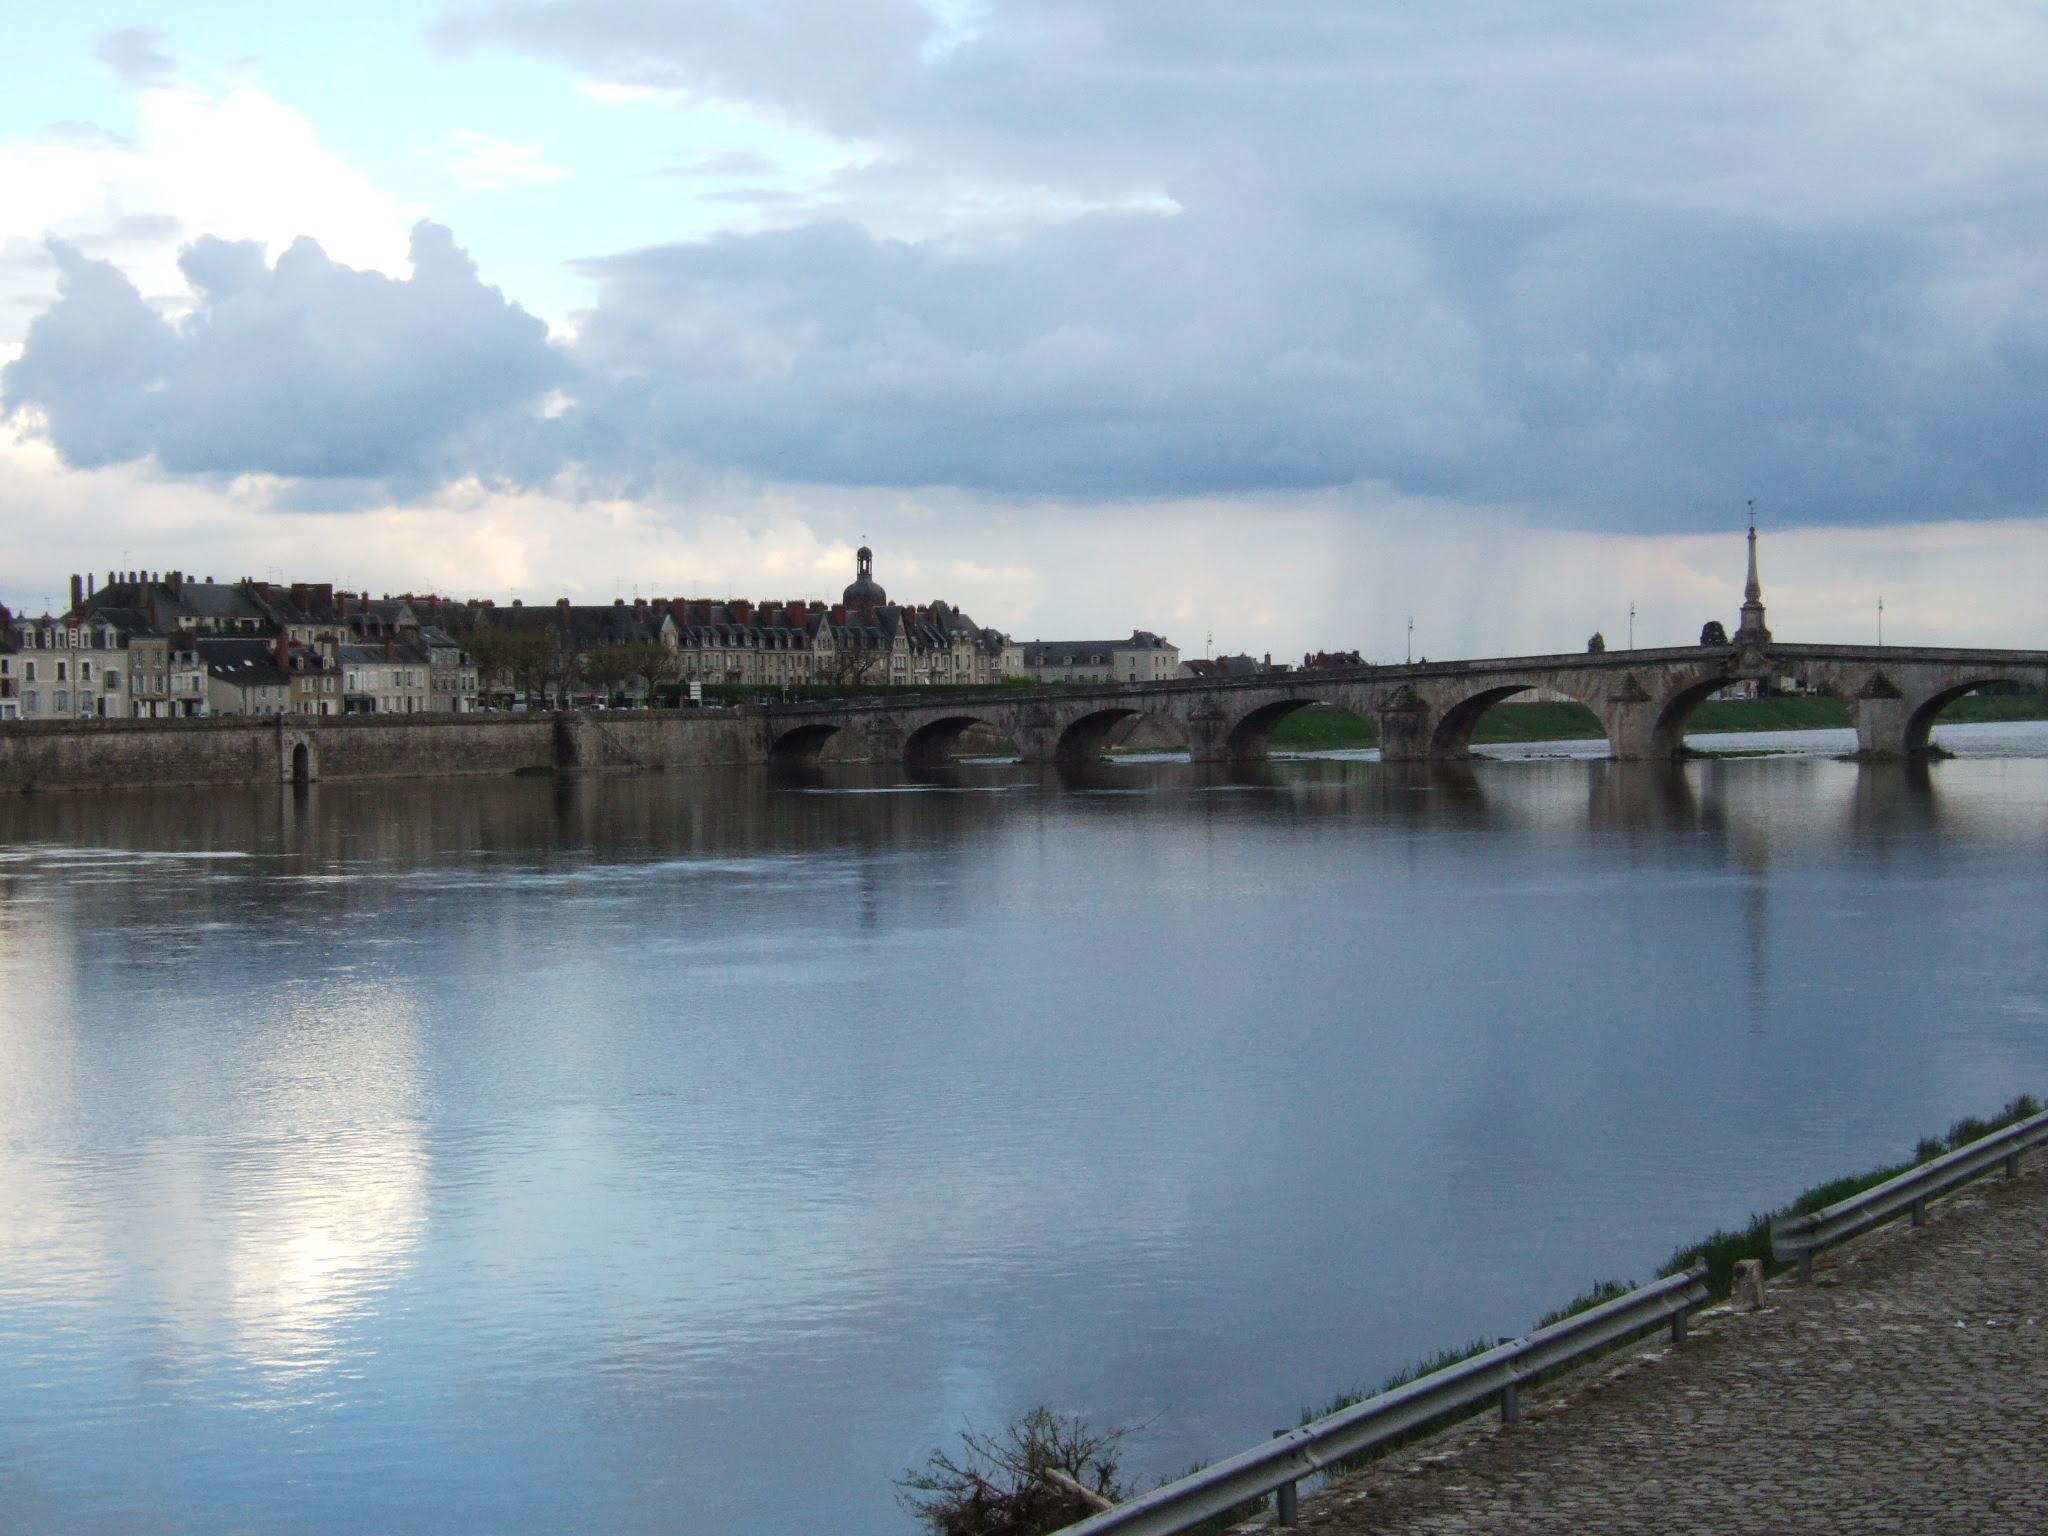 http://upload.wikimedia.org/wikipedia/commons/1/12/Loire_River_Blois.jpg